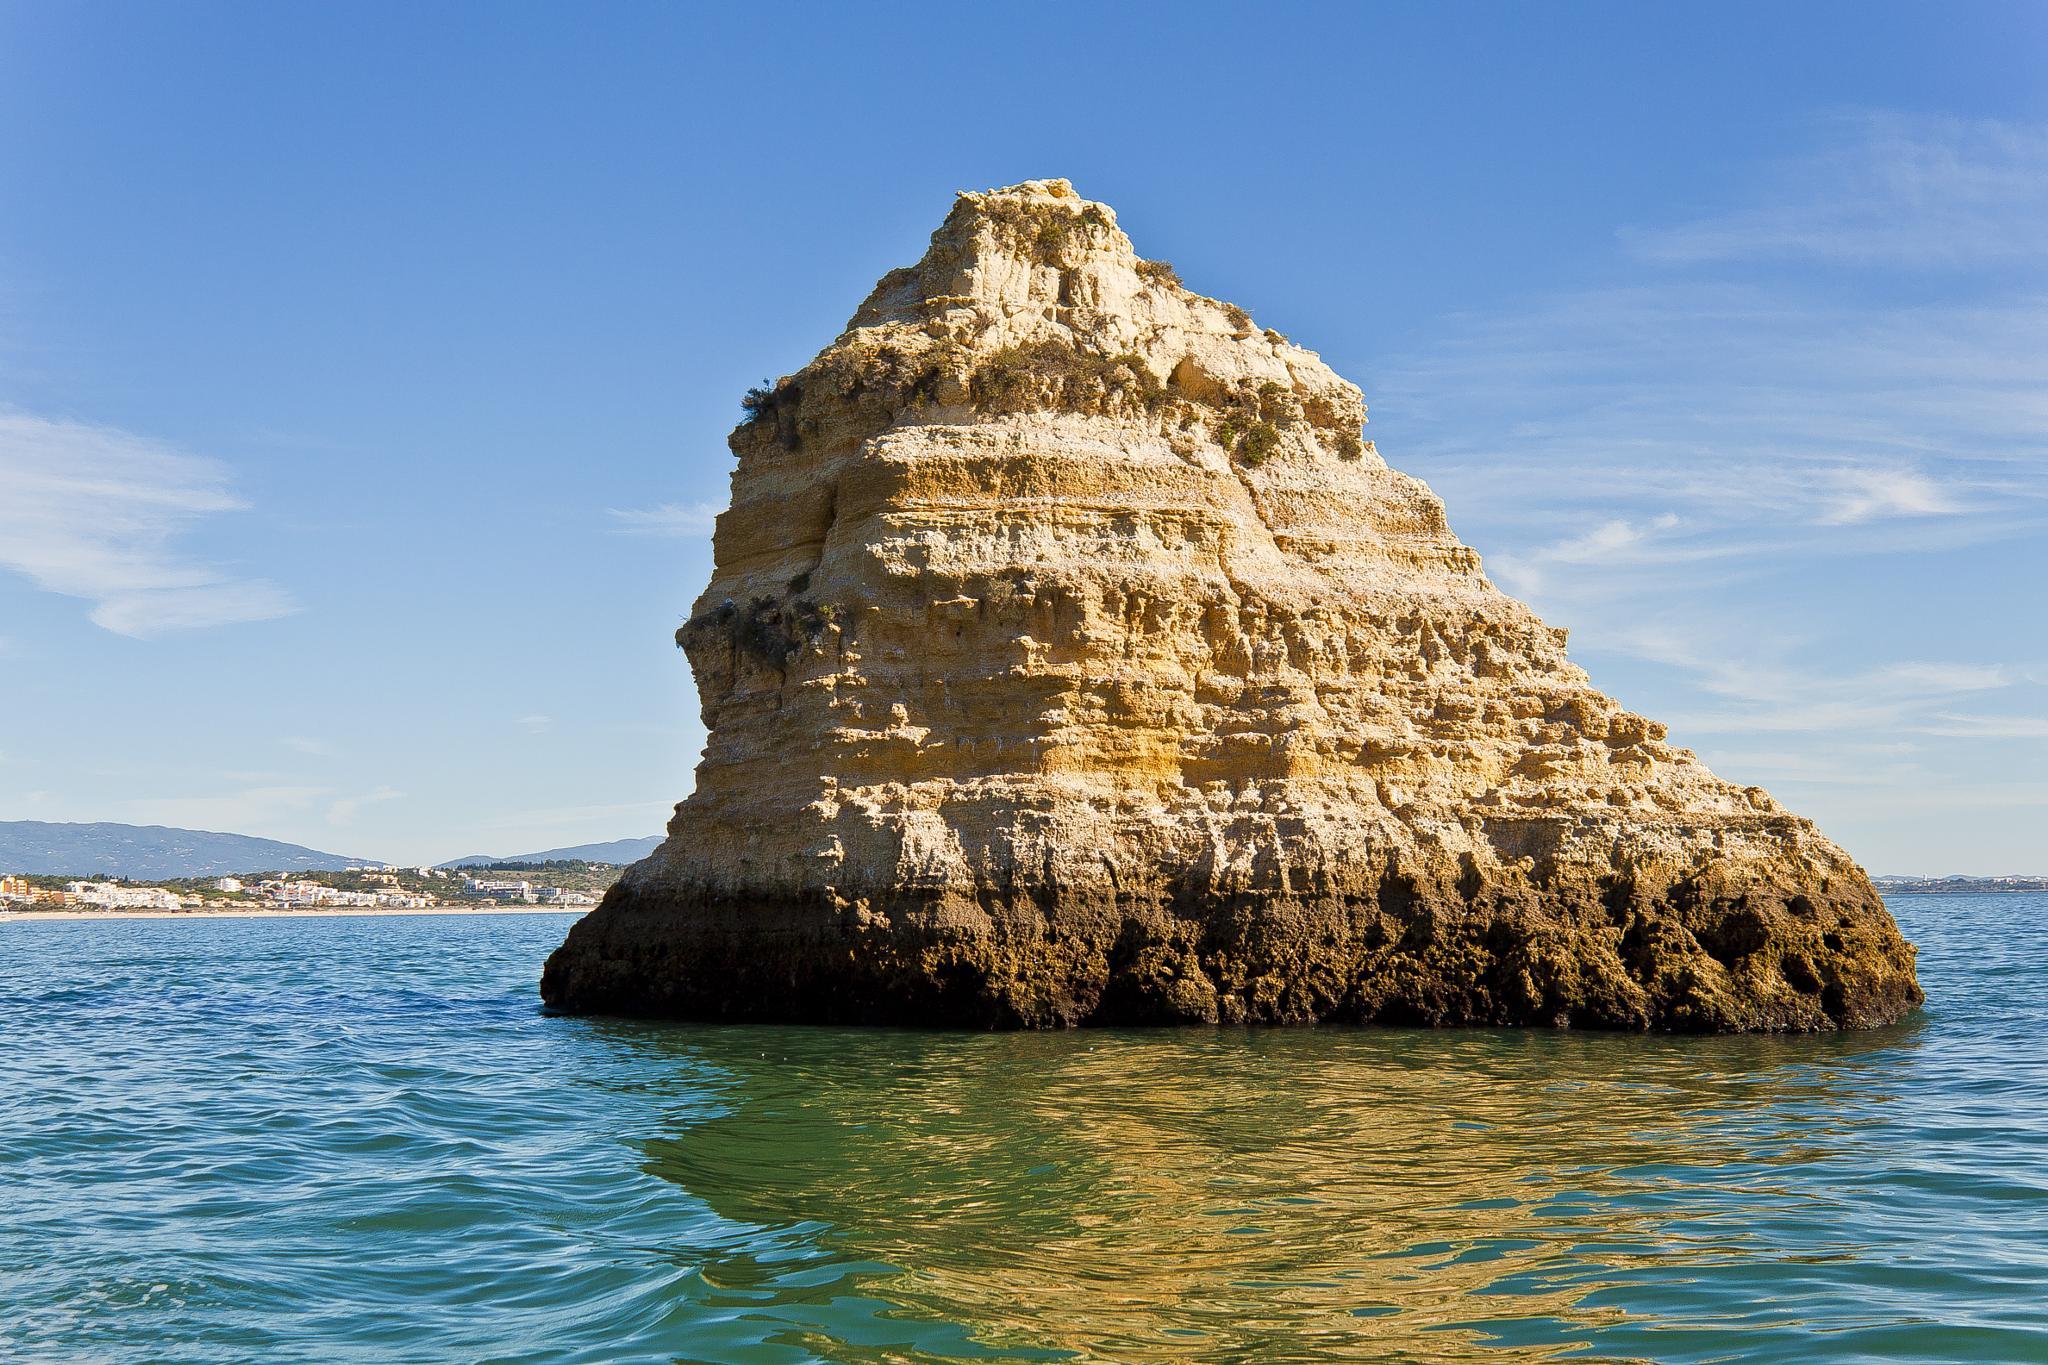 Lagos, Algarve by SparkyD90